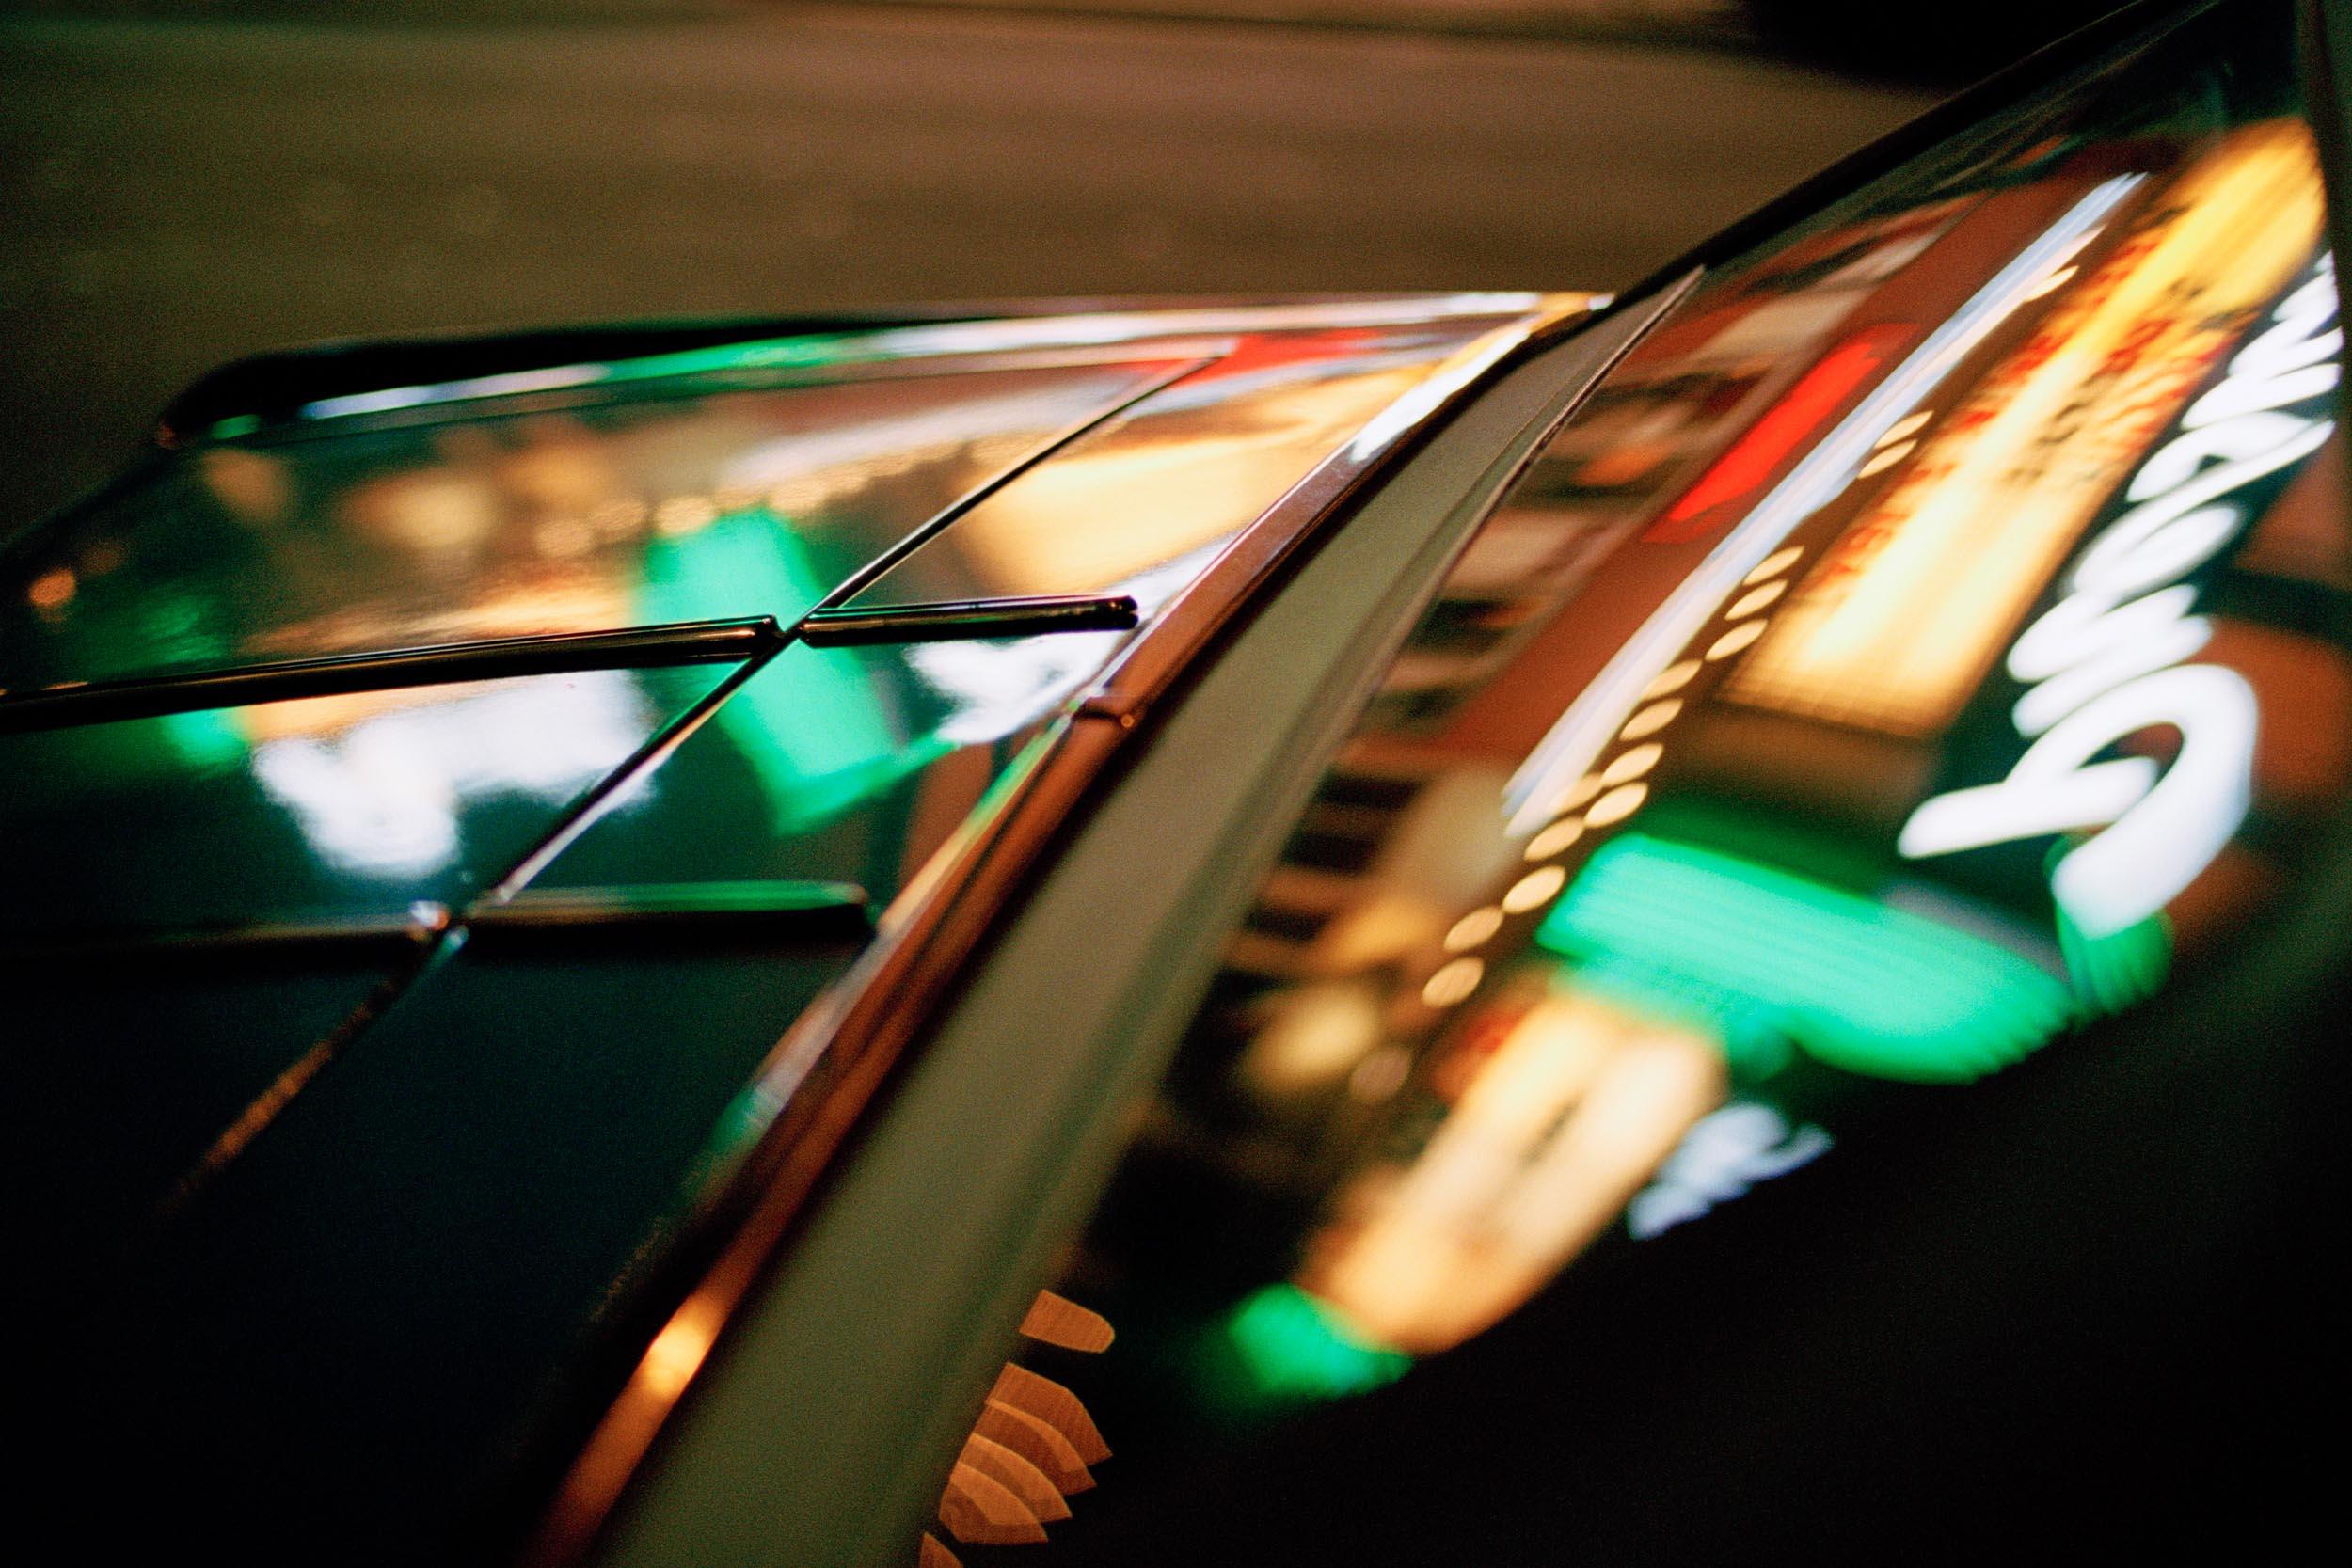 15Presidio Bonnet RT_documentary photographer, documentary scotland, freelance photographer, photographer edinburgh, photographer scotland, glasgow, mat hay, photographer london, L.A., california, los angelese, london, sunset strip, sunset boulevard.jpg